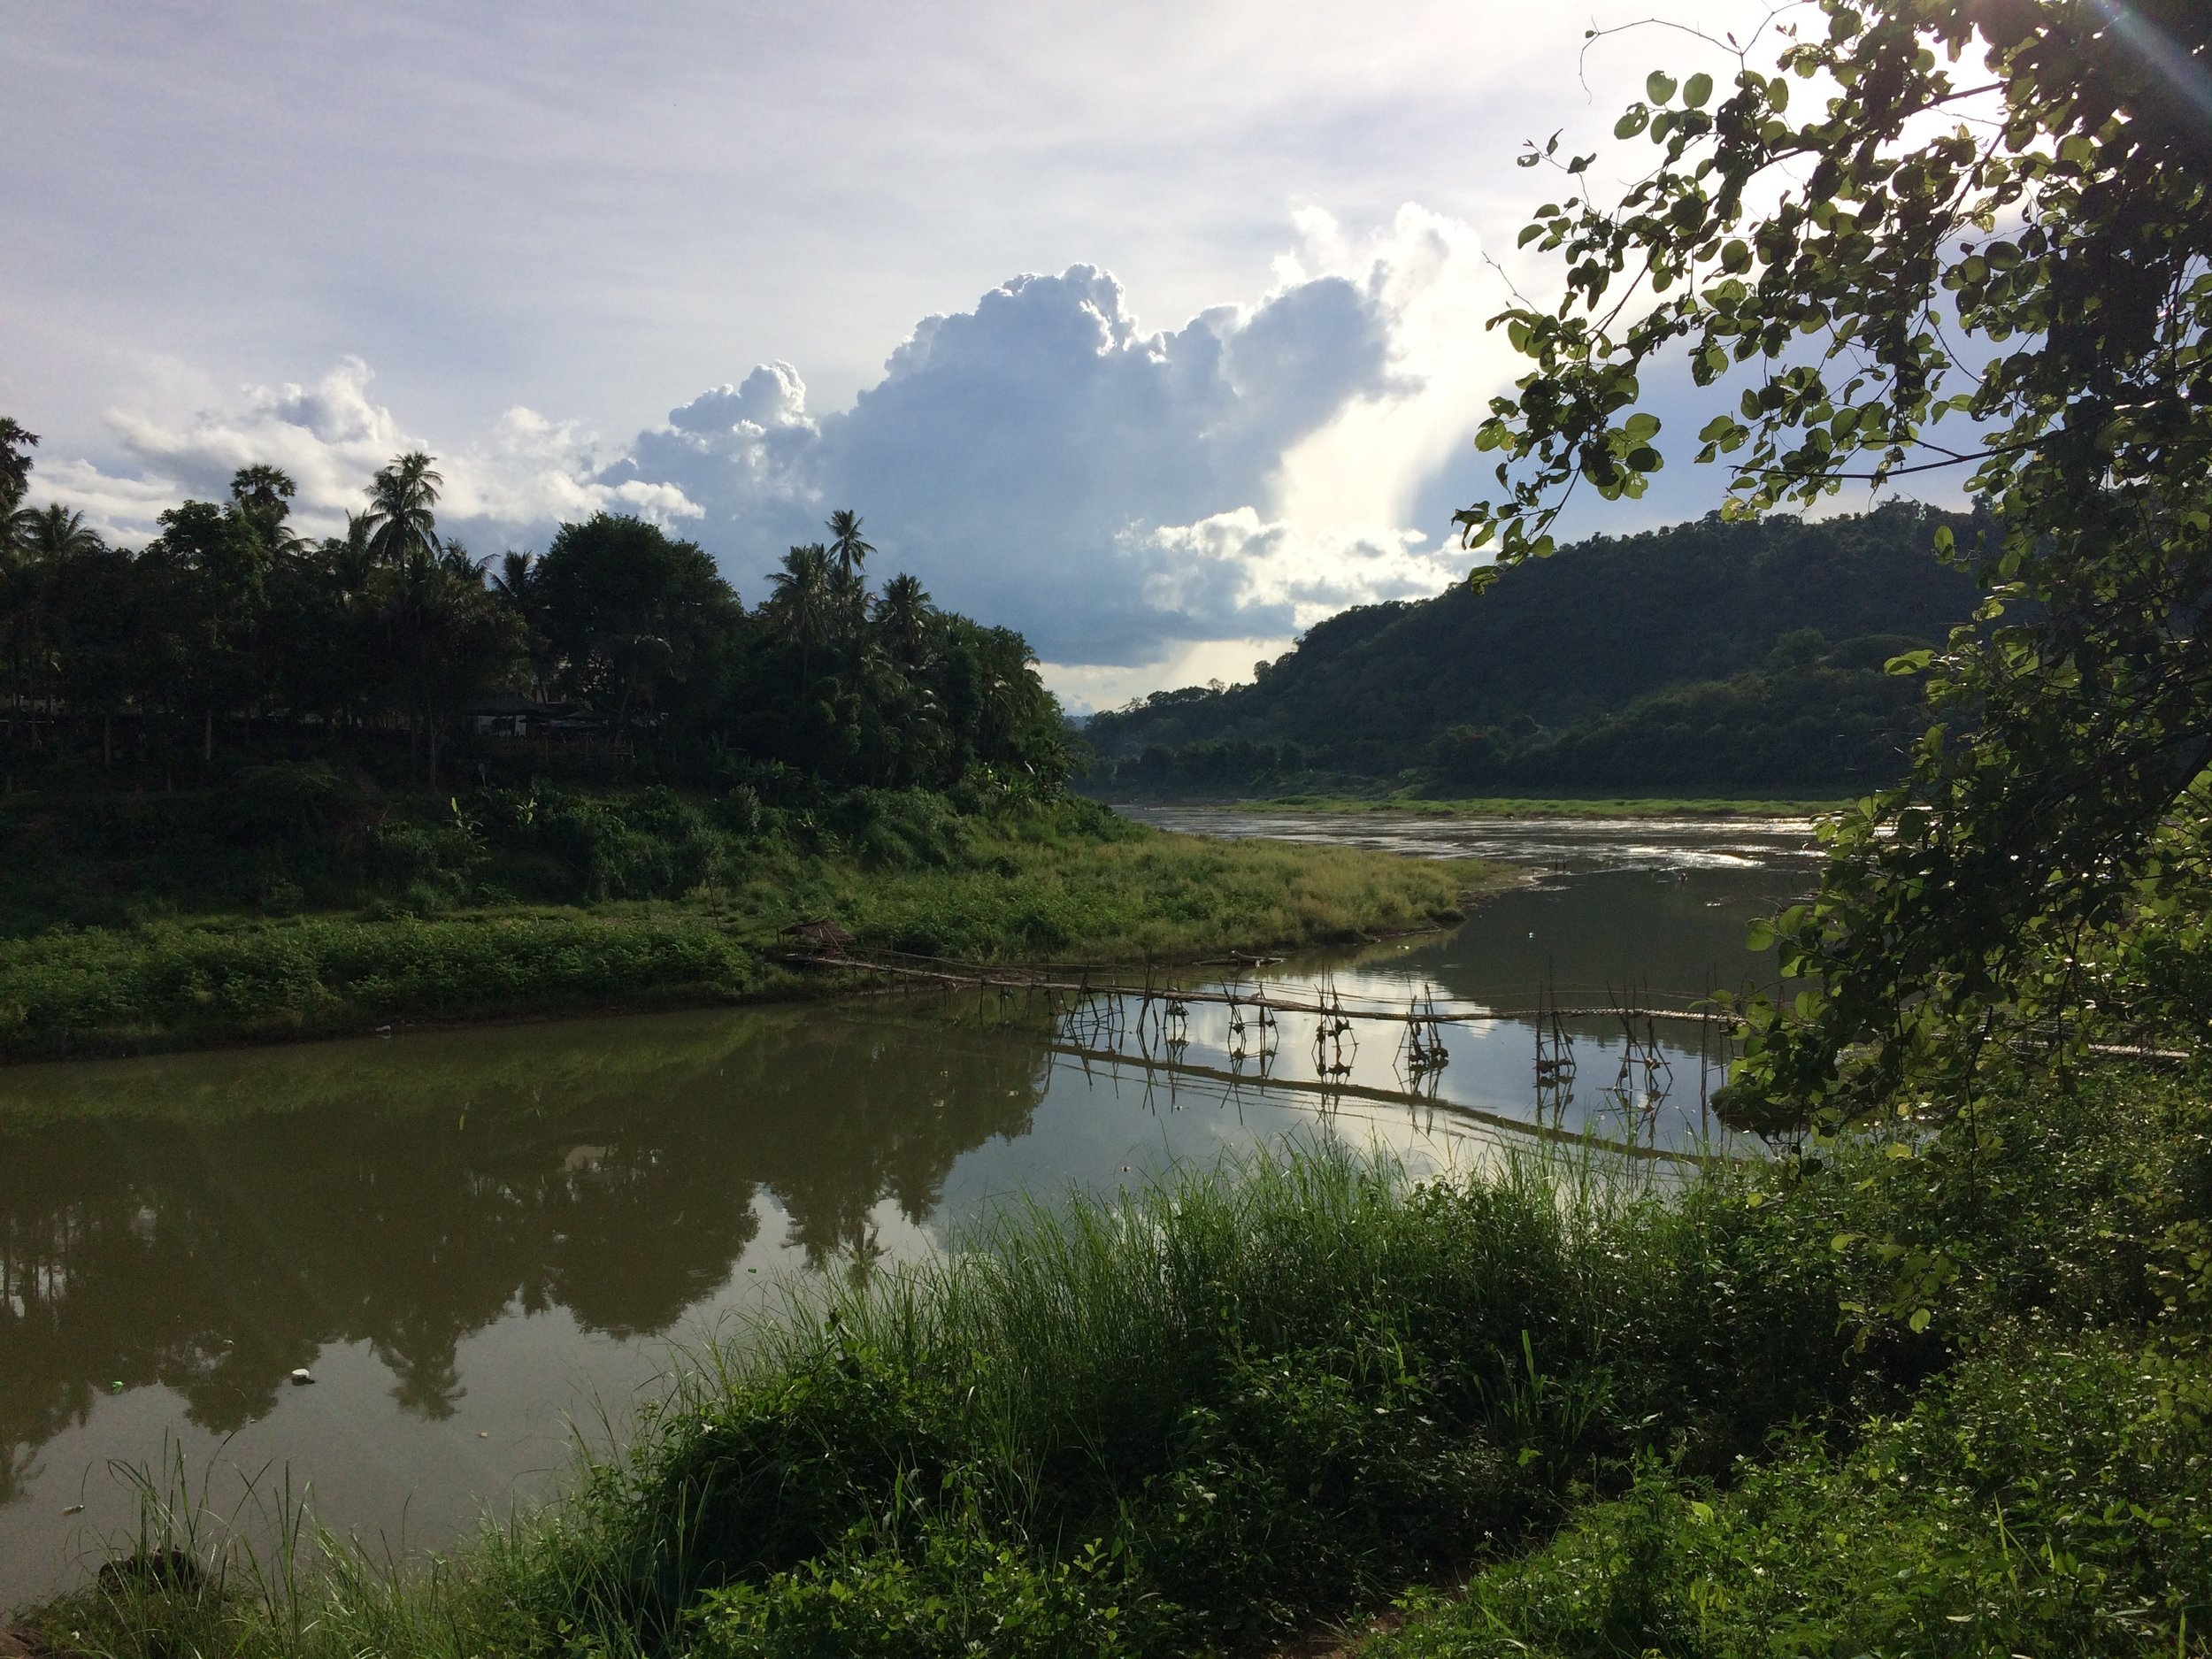 Crossing the bamboo bridge from the handicraft village